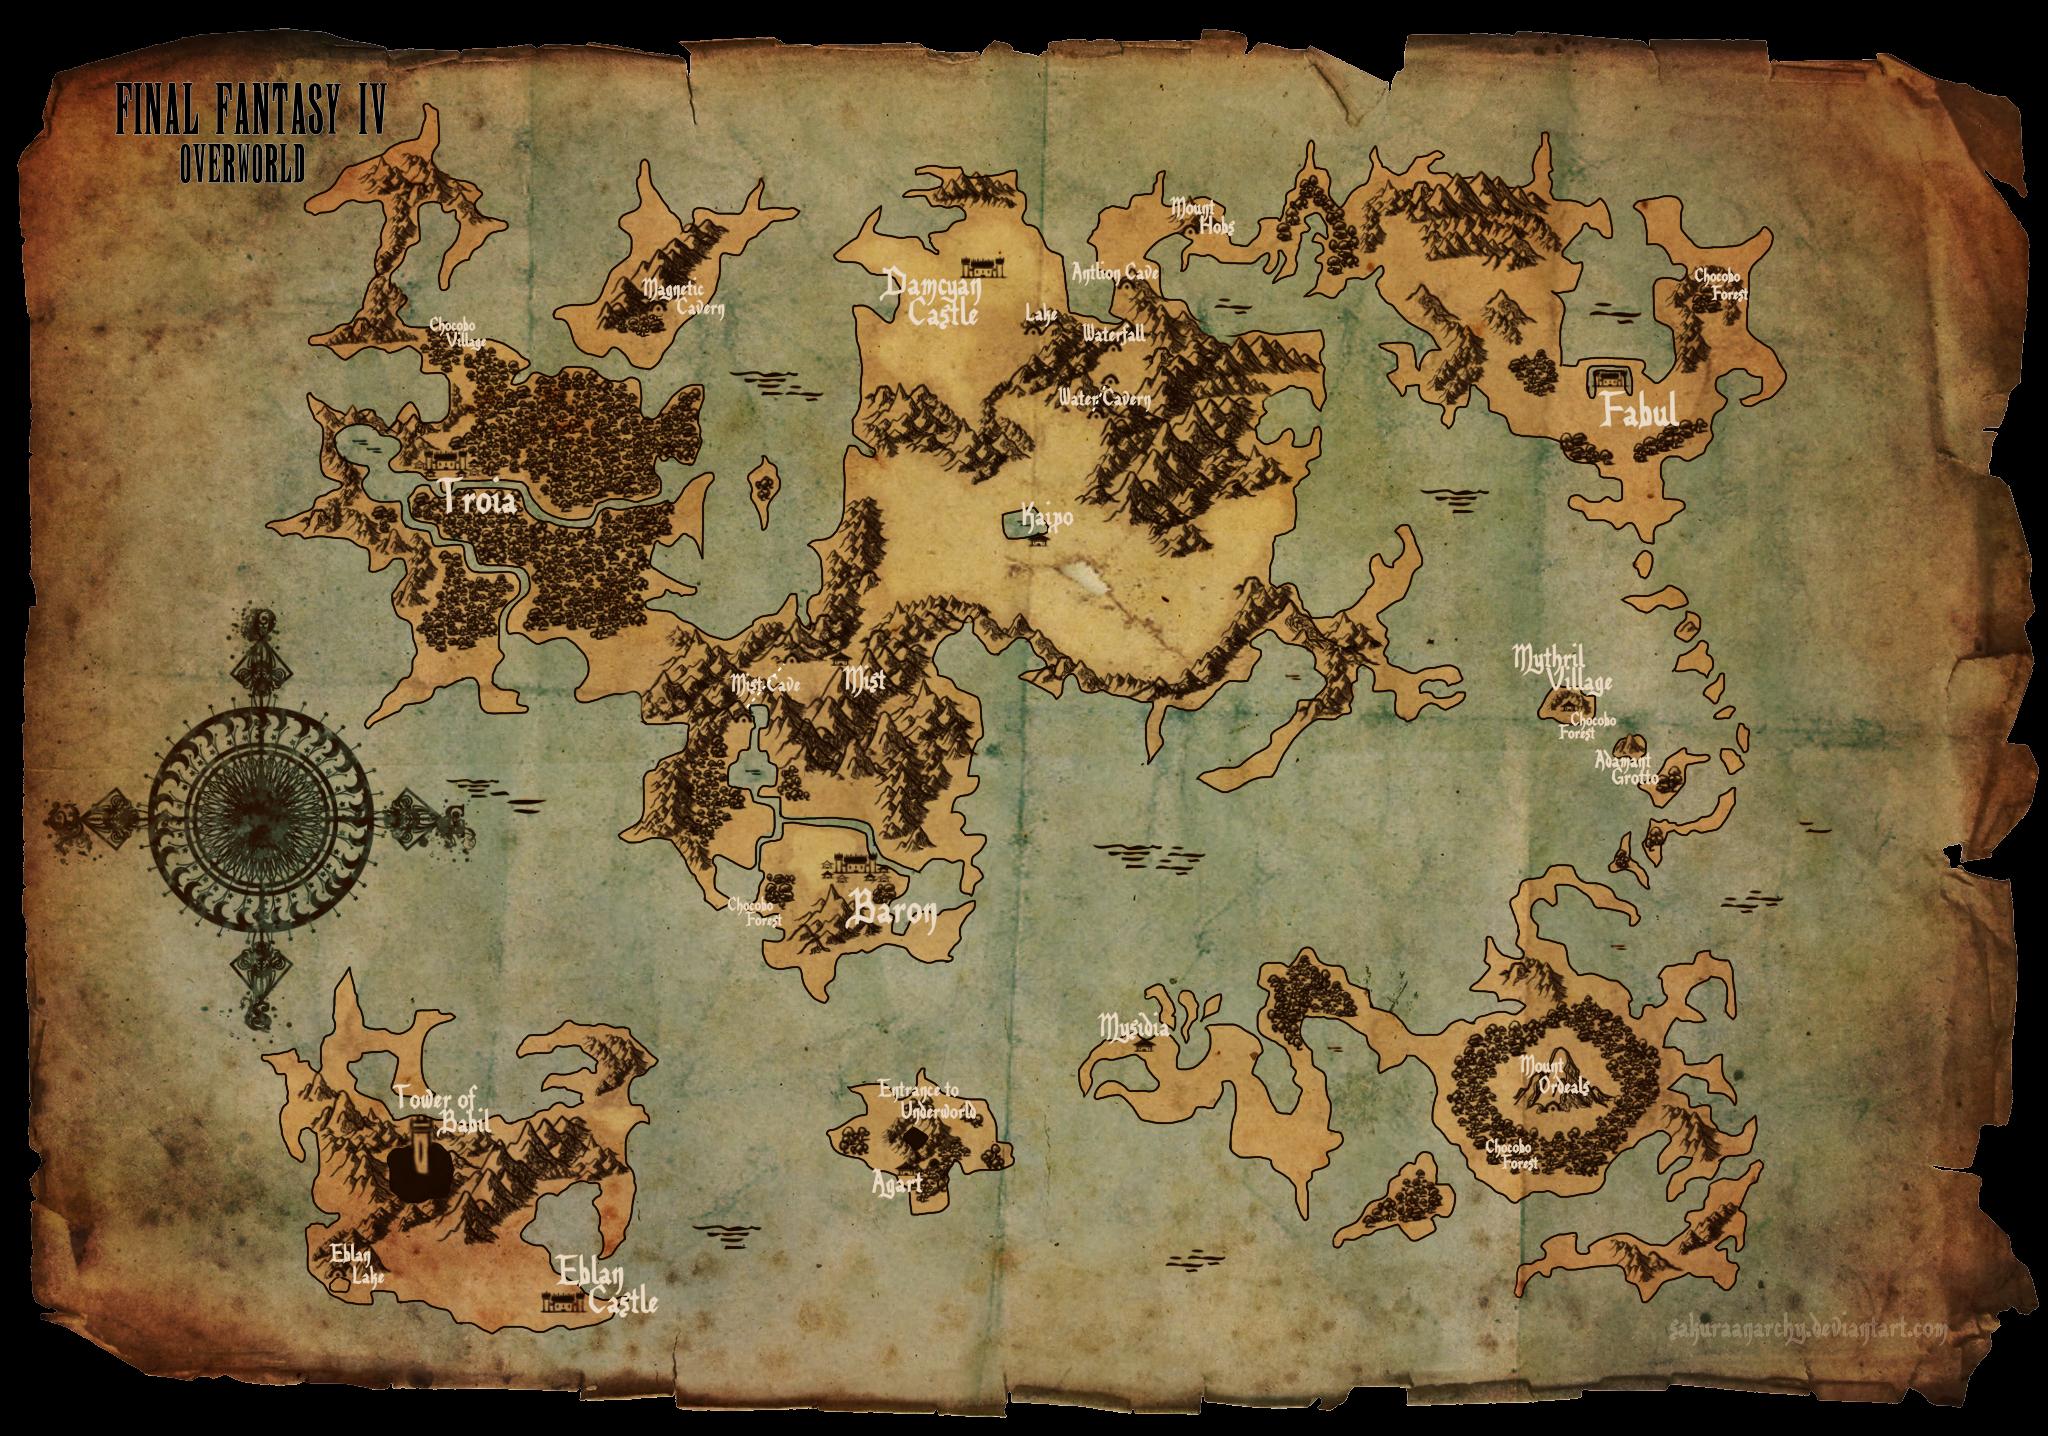 Final+Fantasy+IV+-+Overworld+Map+by+SakuraAnarchy.deviantart ...